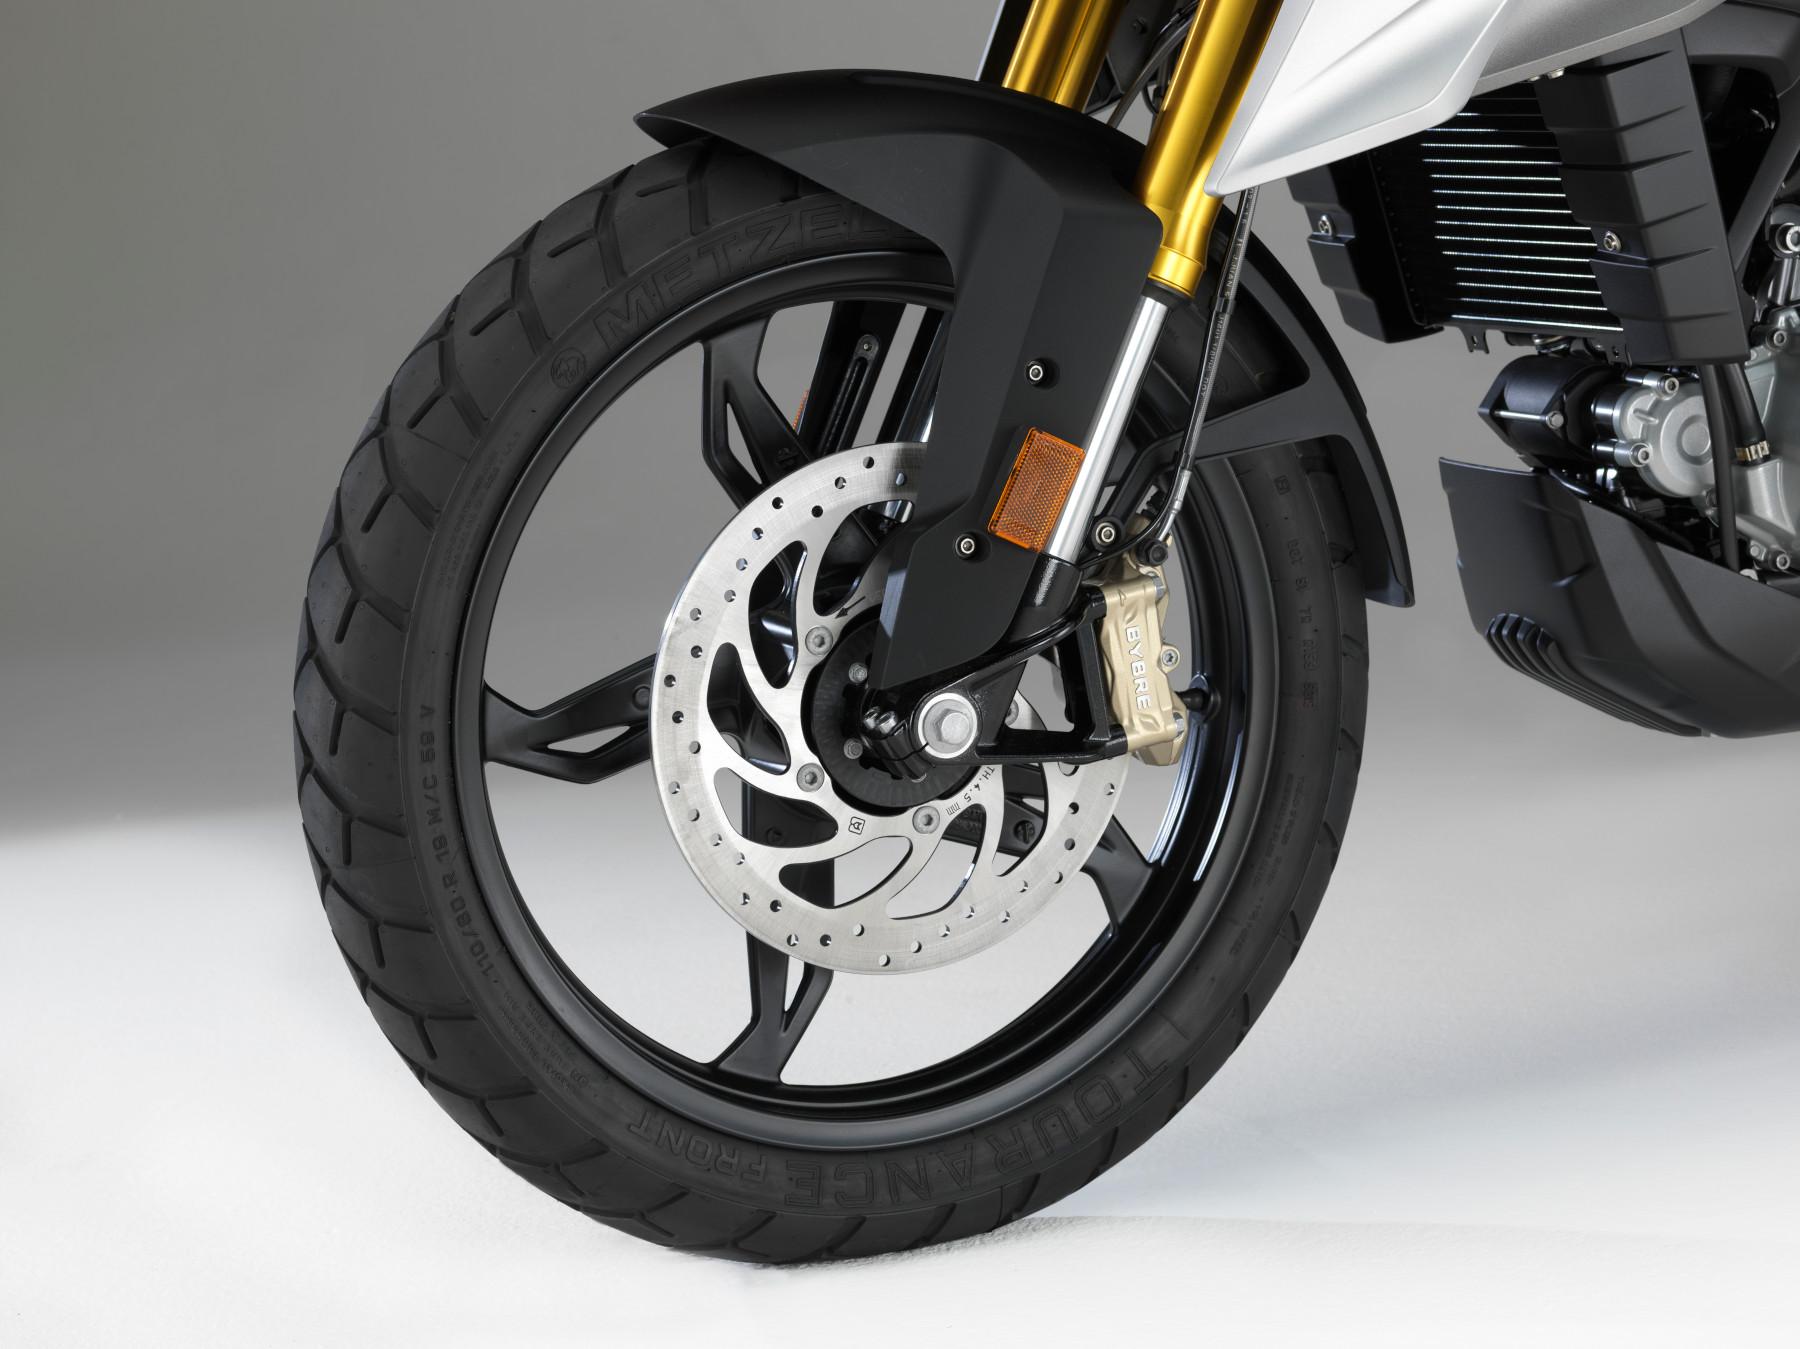 Revisiones básicas para que tu moto sobreviva a esta cuarentena